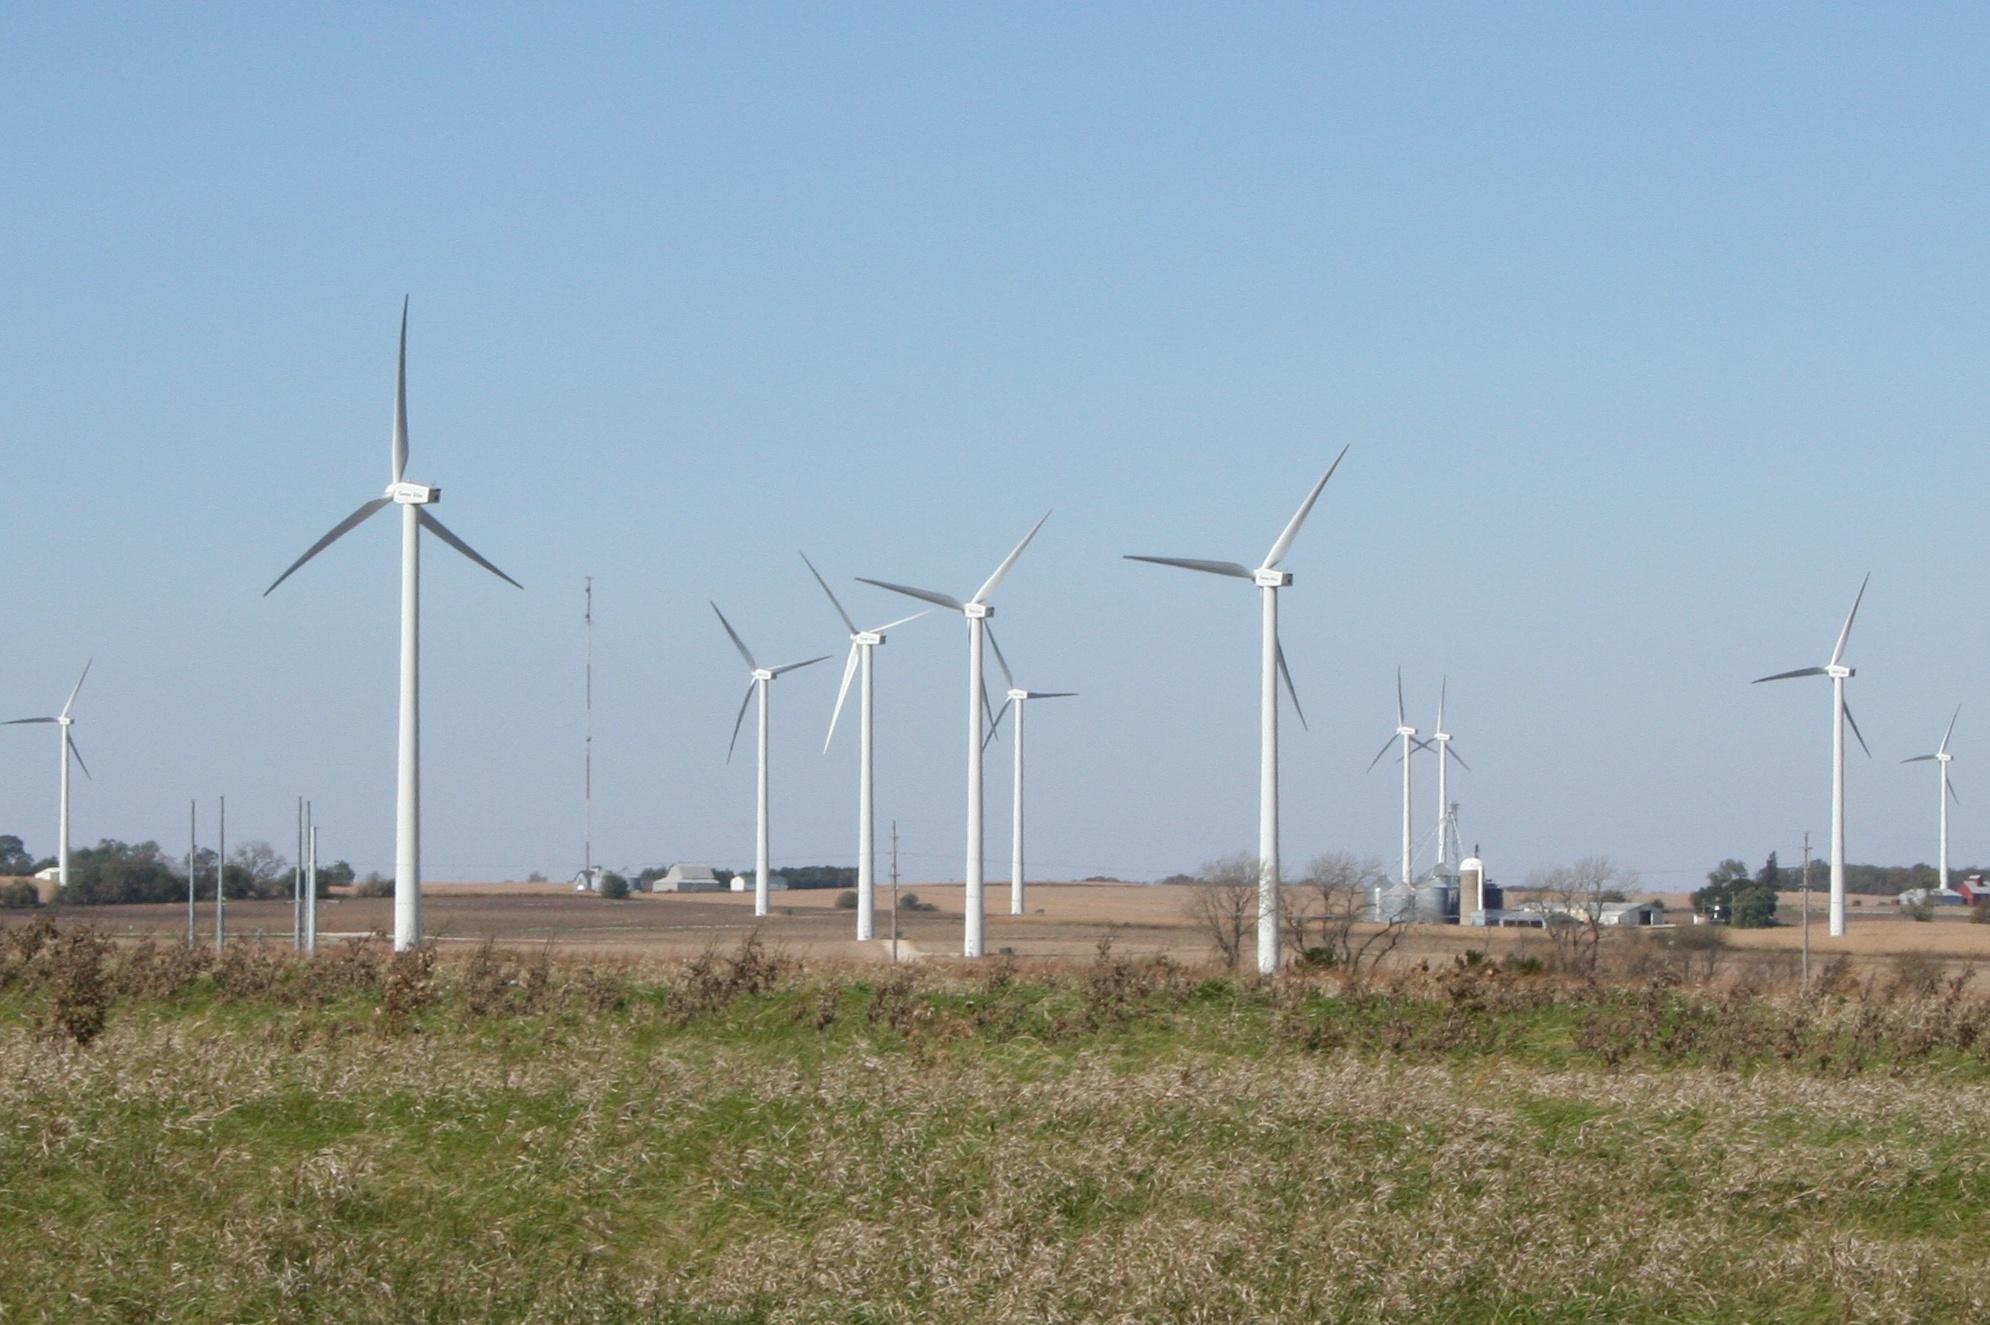 Illinois lee county lee - Lee County Board Approves Mendota Hills Wind Farm Improvements